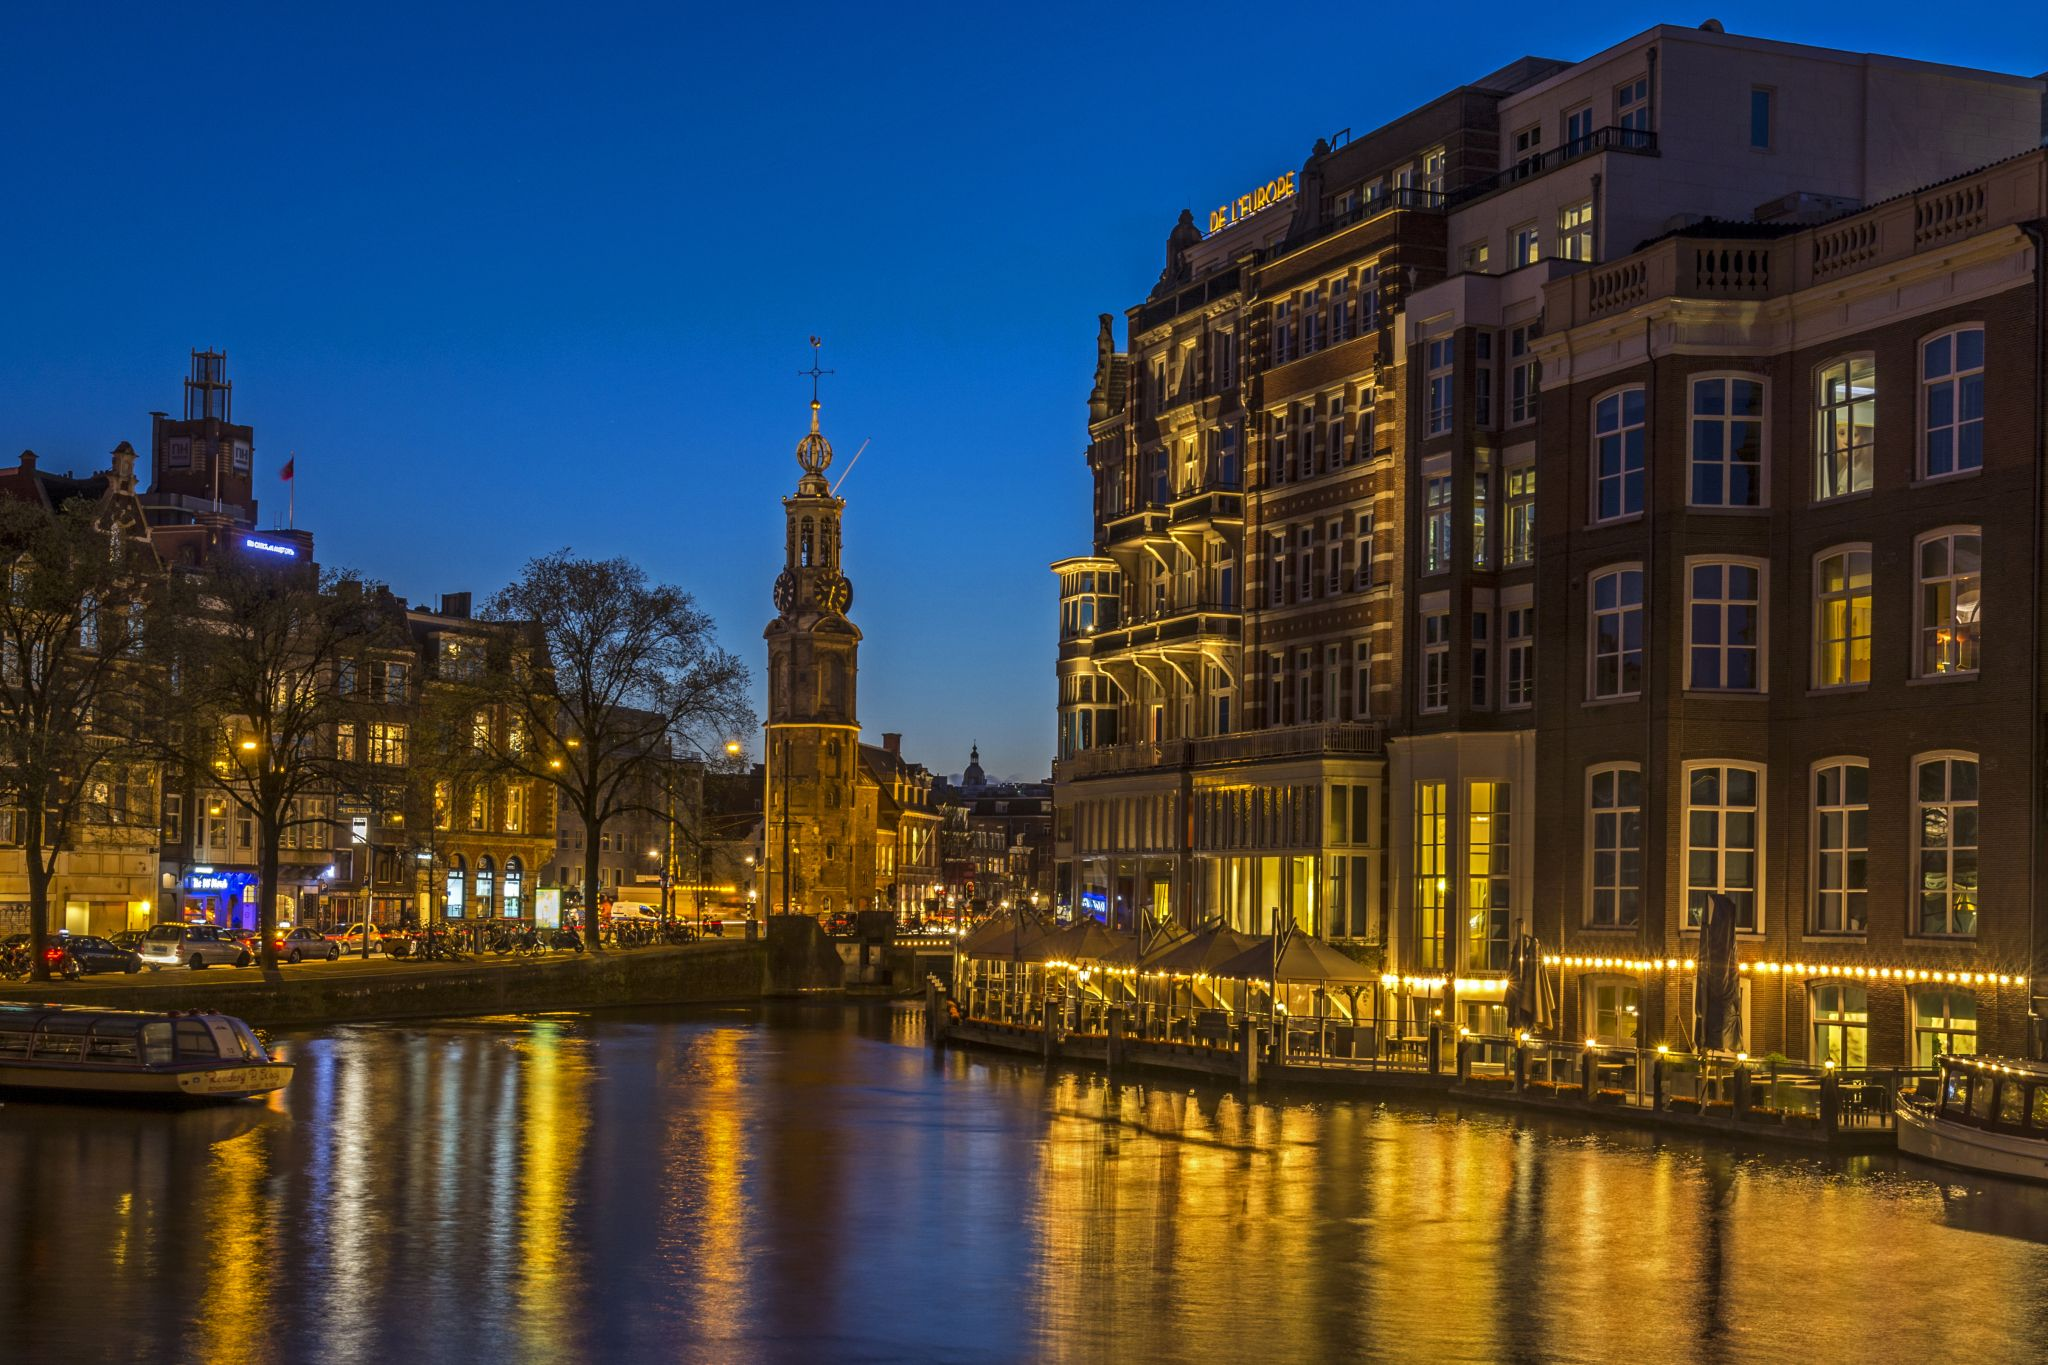 The Muntorren on the Amstel River, Netherlands